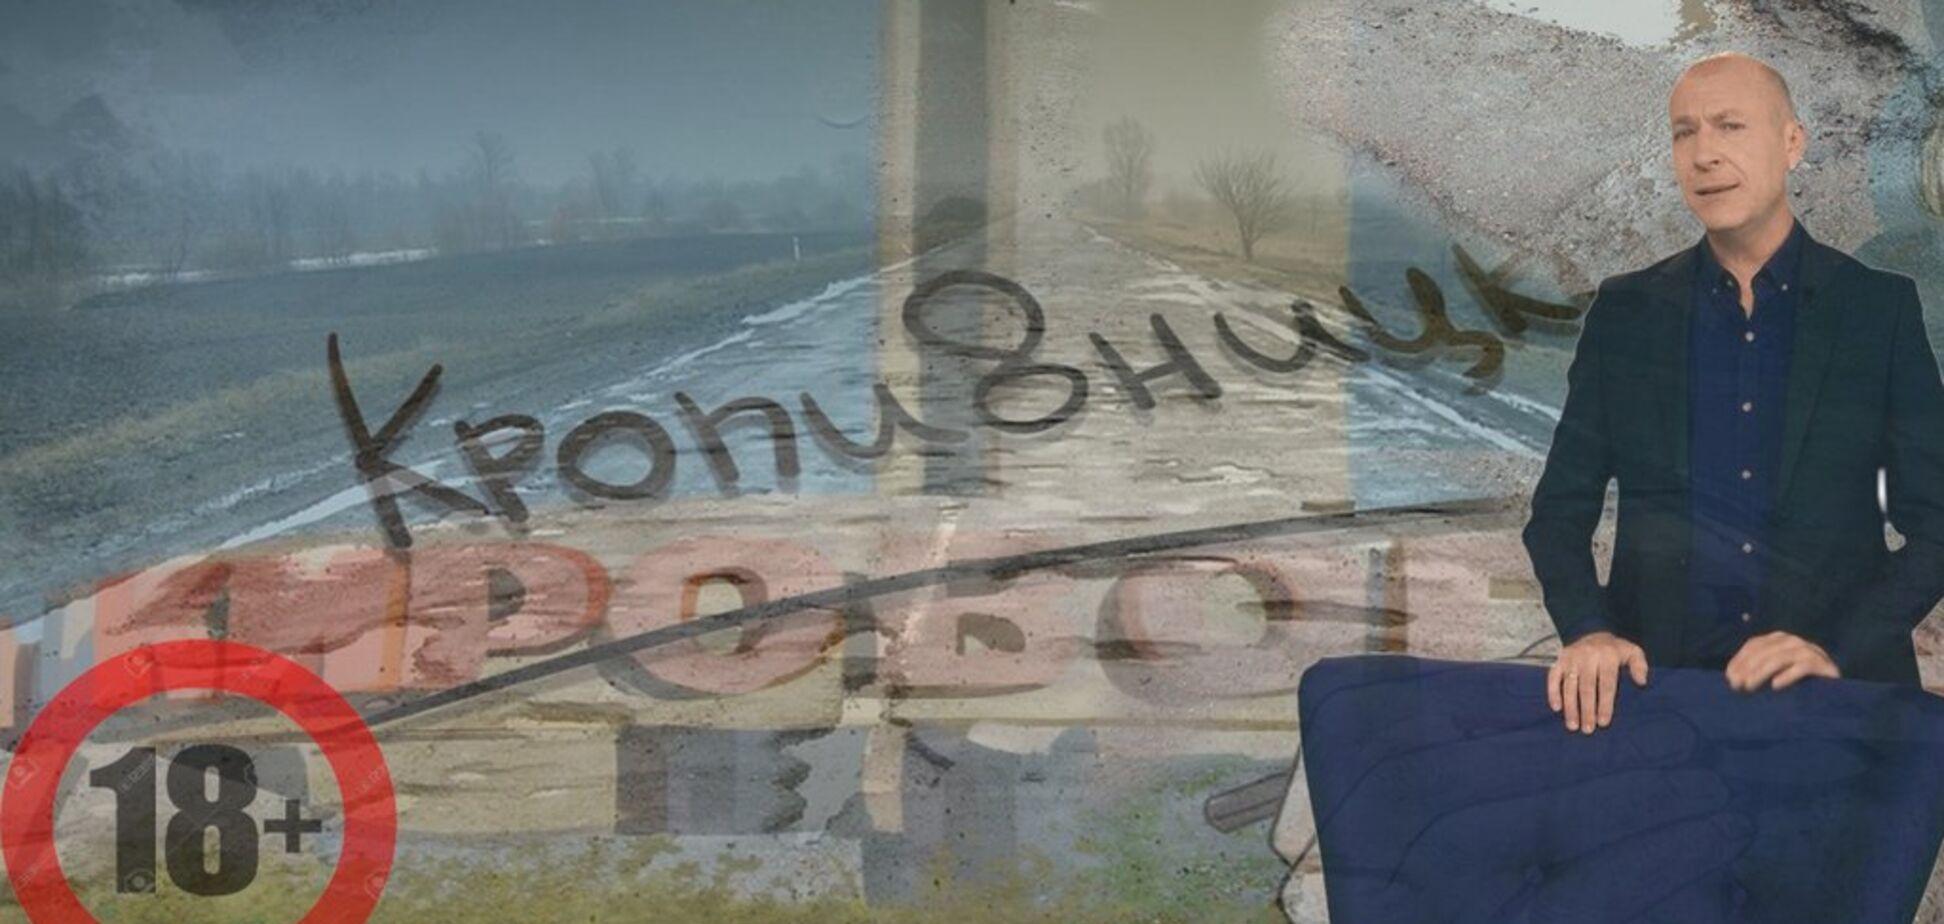 Кропівницько-Кировоградський шалун      Альо, гараж! REBOOT #206